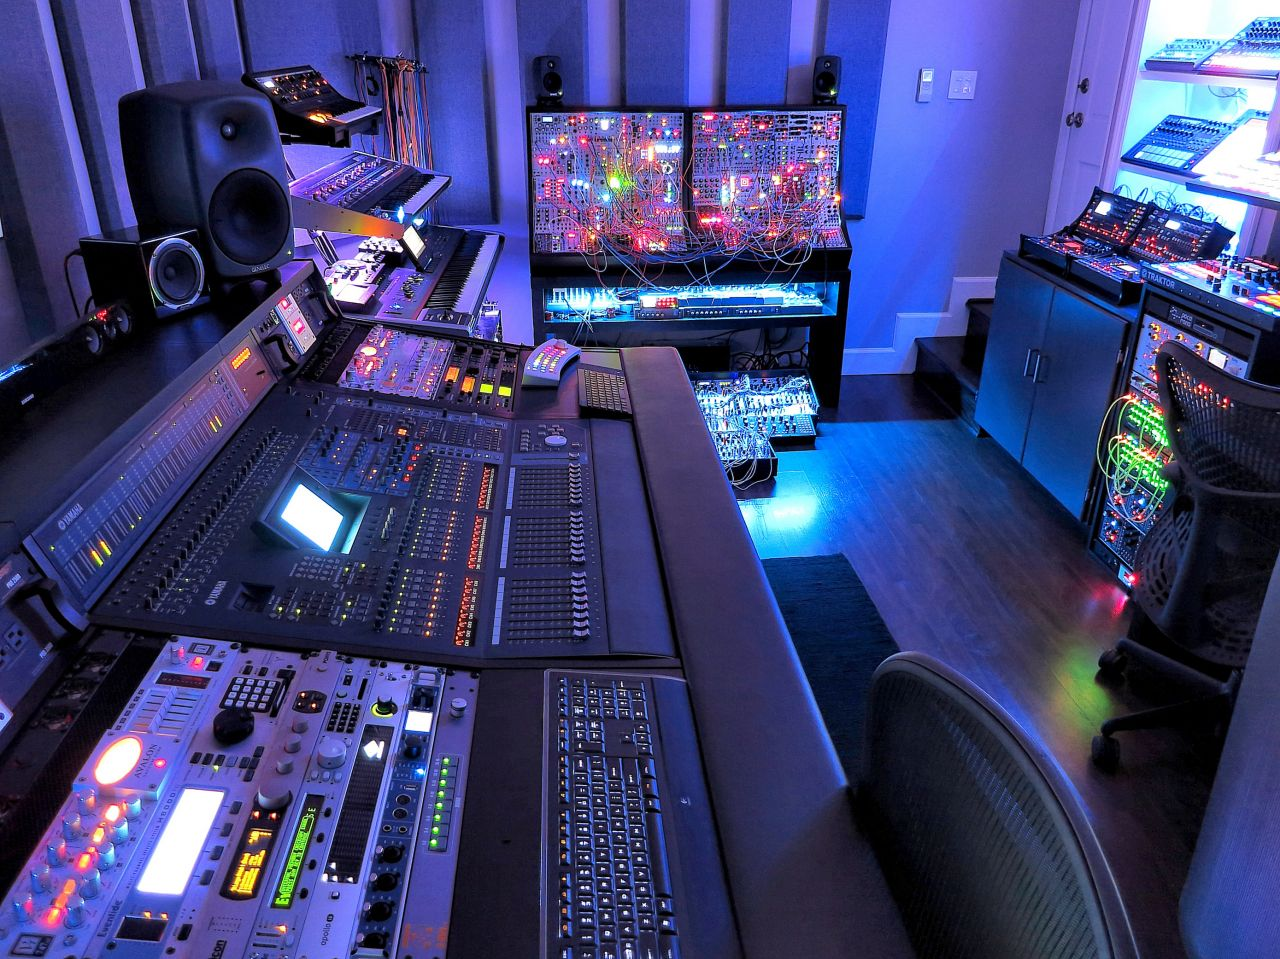 MIDI Artist Interview with Richard Devine and Michael Loh